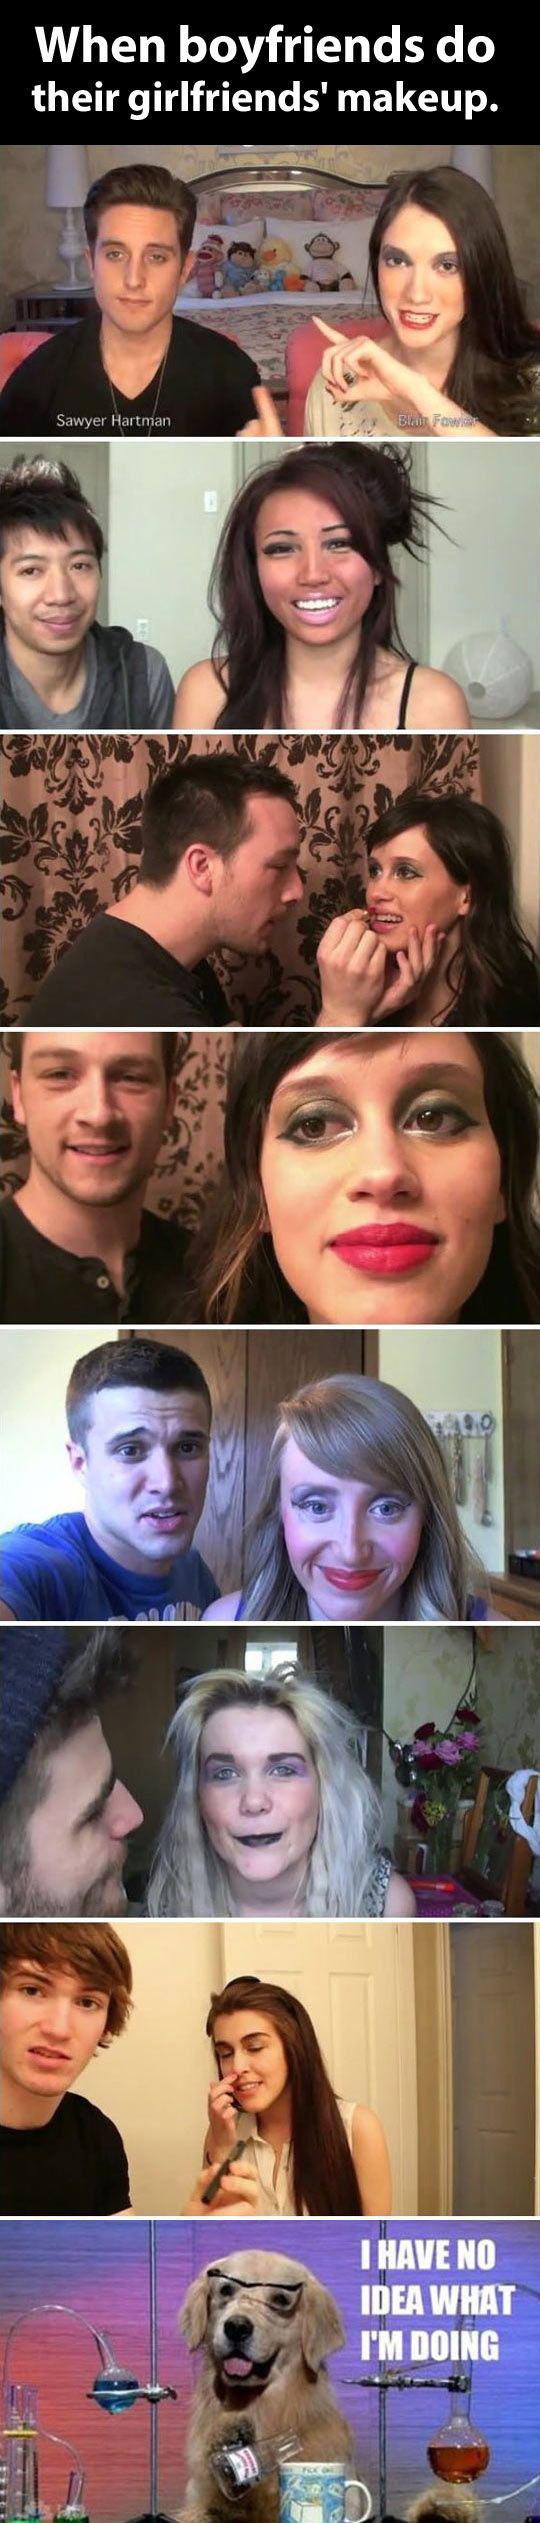 Boyfriends Don't Do Make-Up